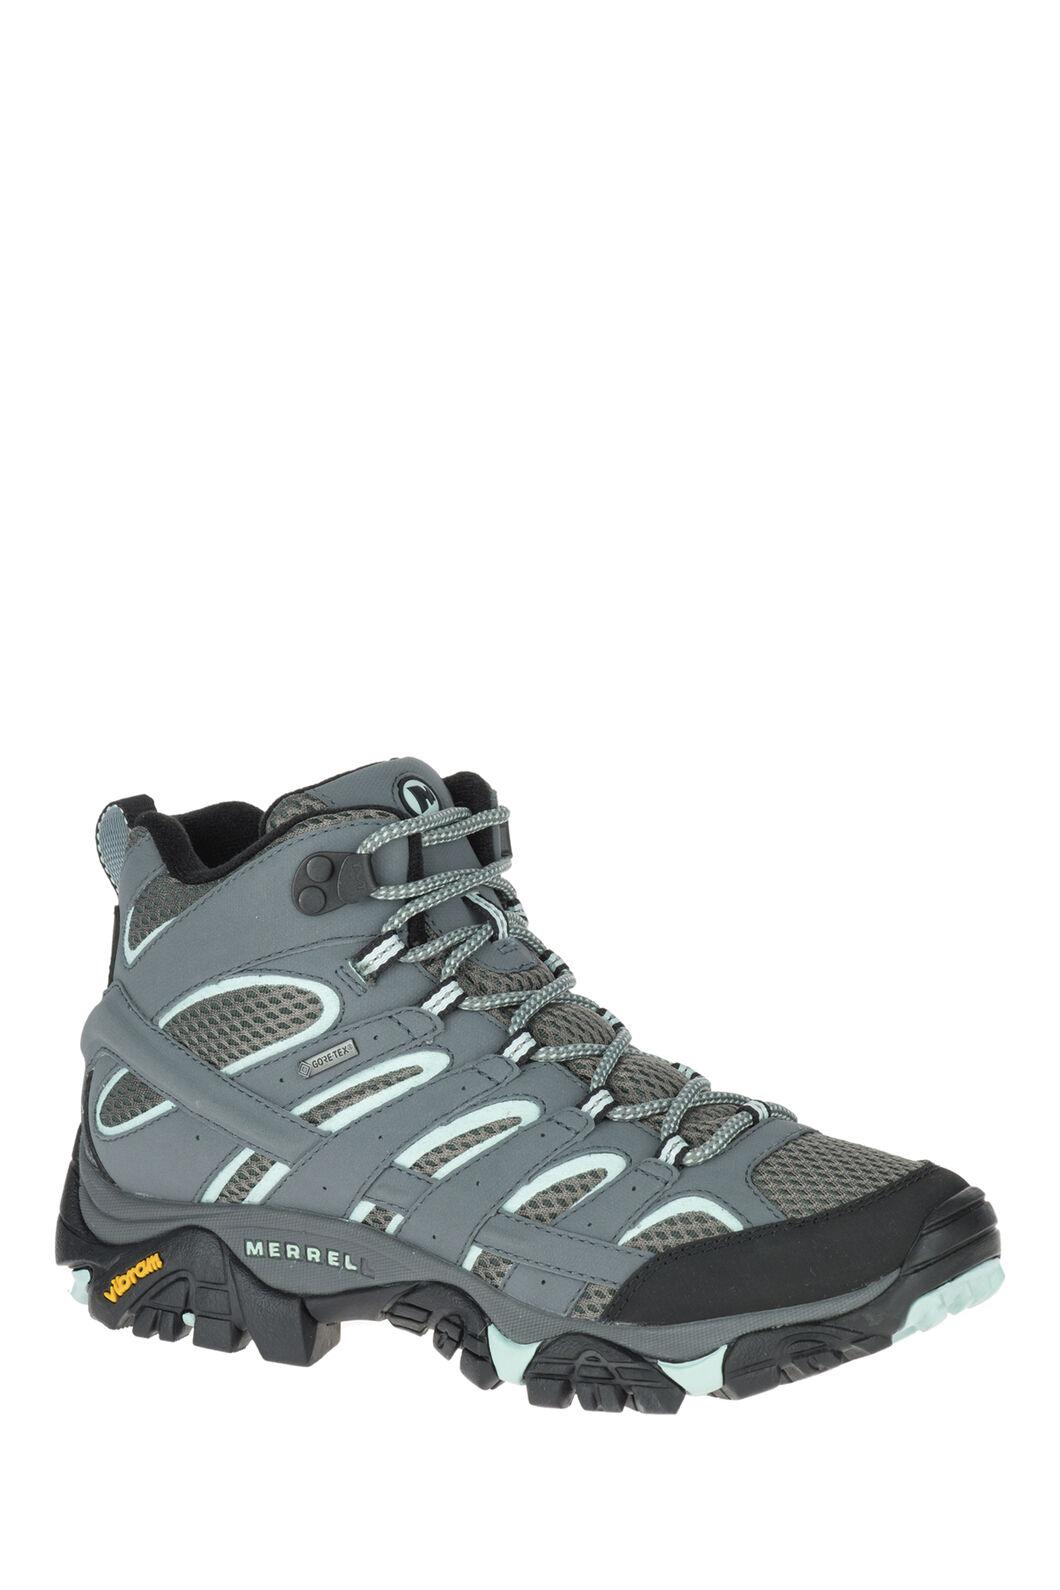 Merrell Moab 2 GTX Hiking Boot — Women's, Sedona Sage, hi-res